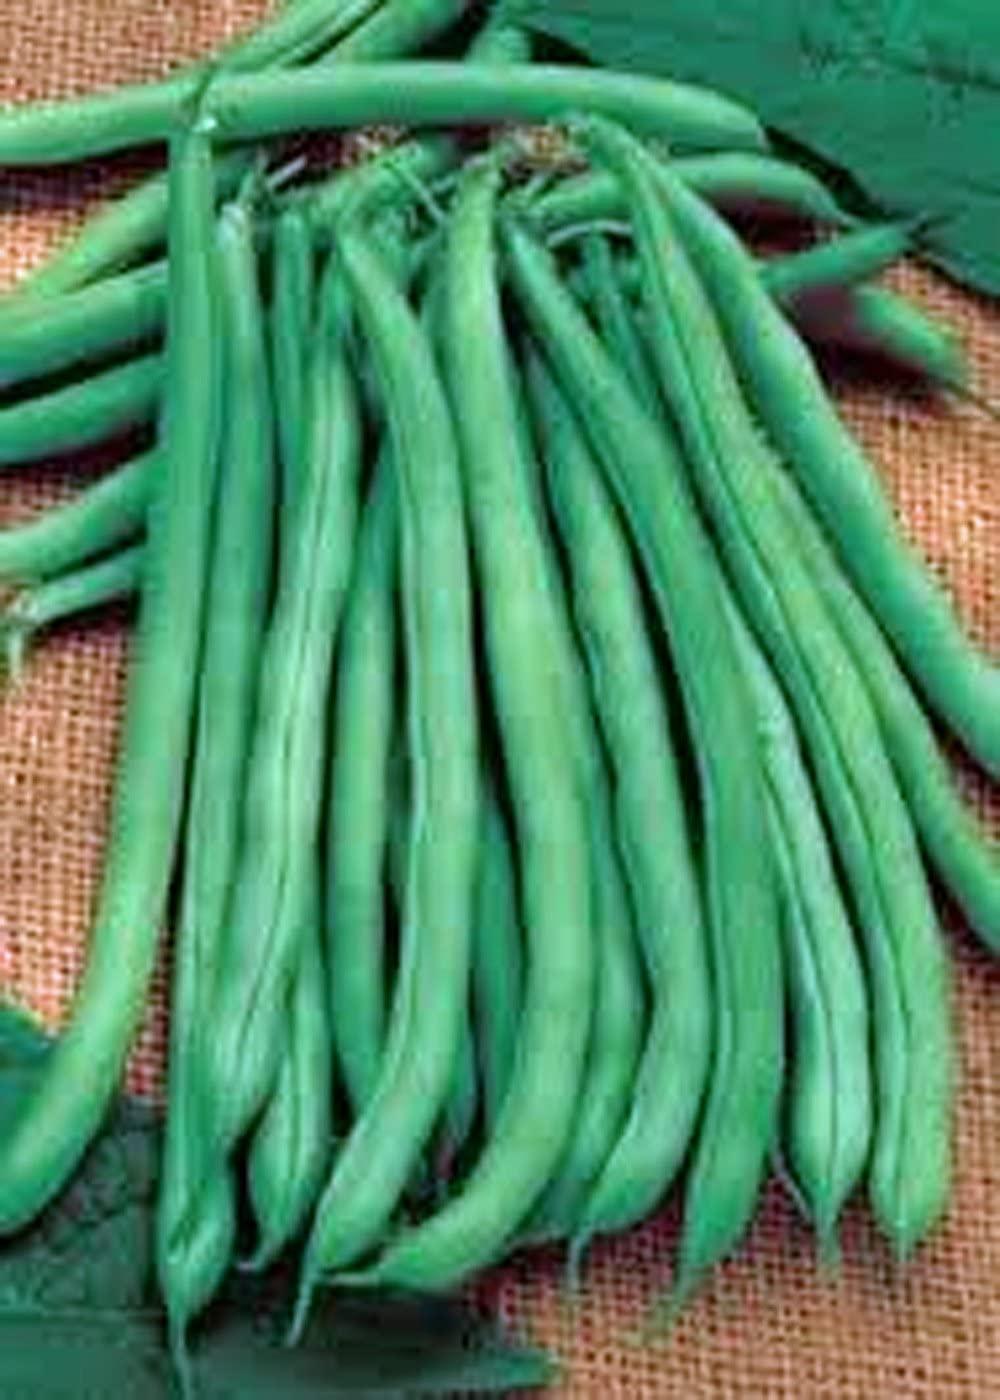 Green Bean, Blue Lake, Heirloom,500+ Seeds, Non-GMO, Tasty N Healty Beans